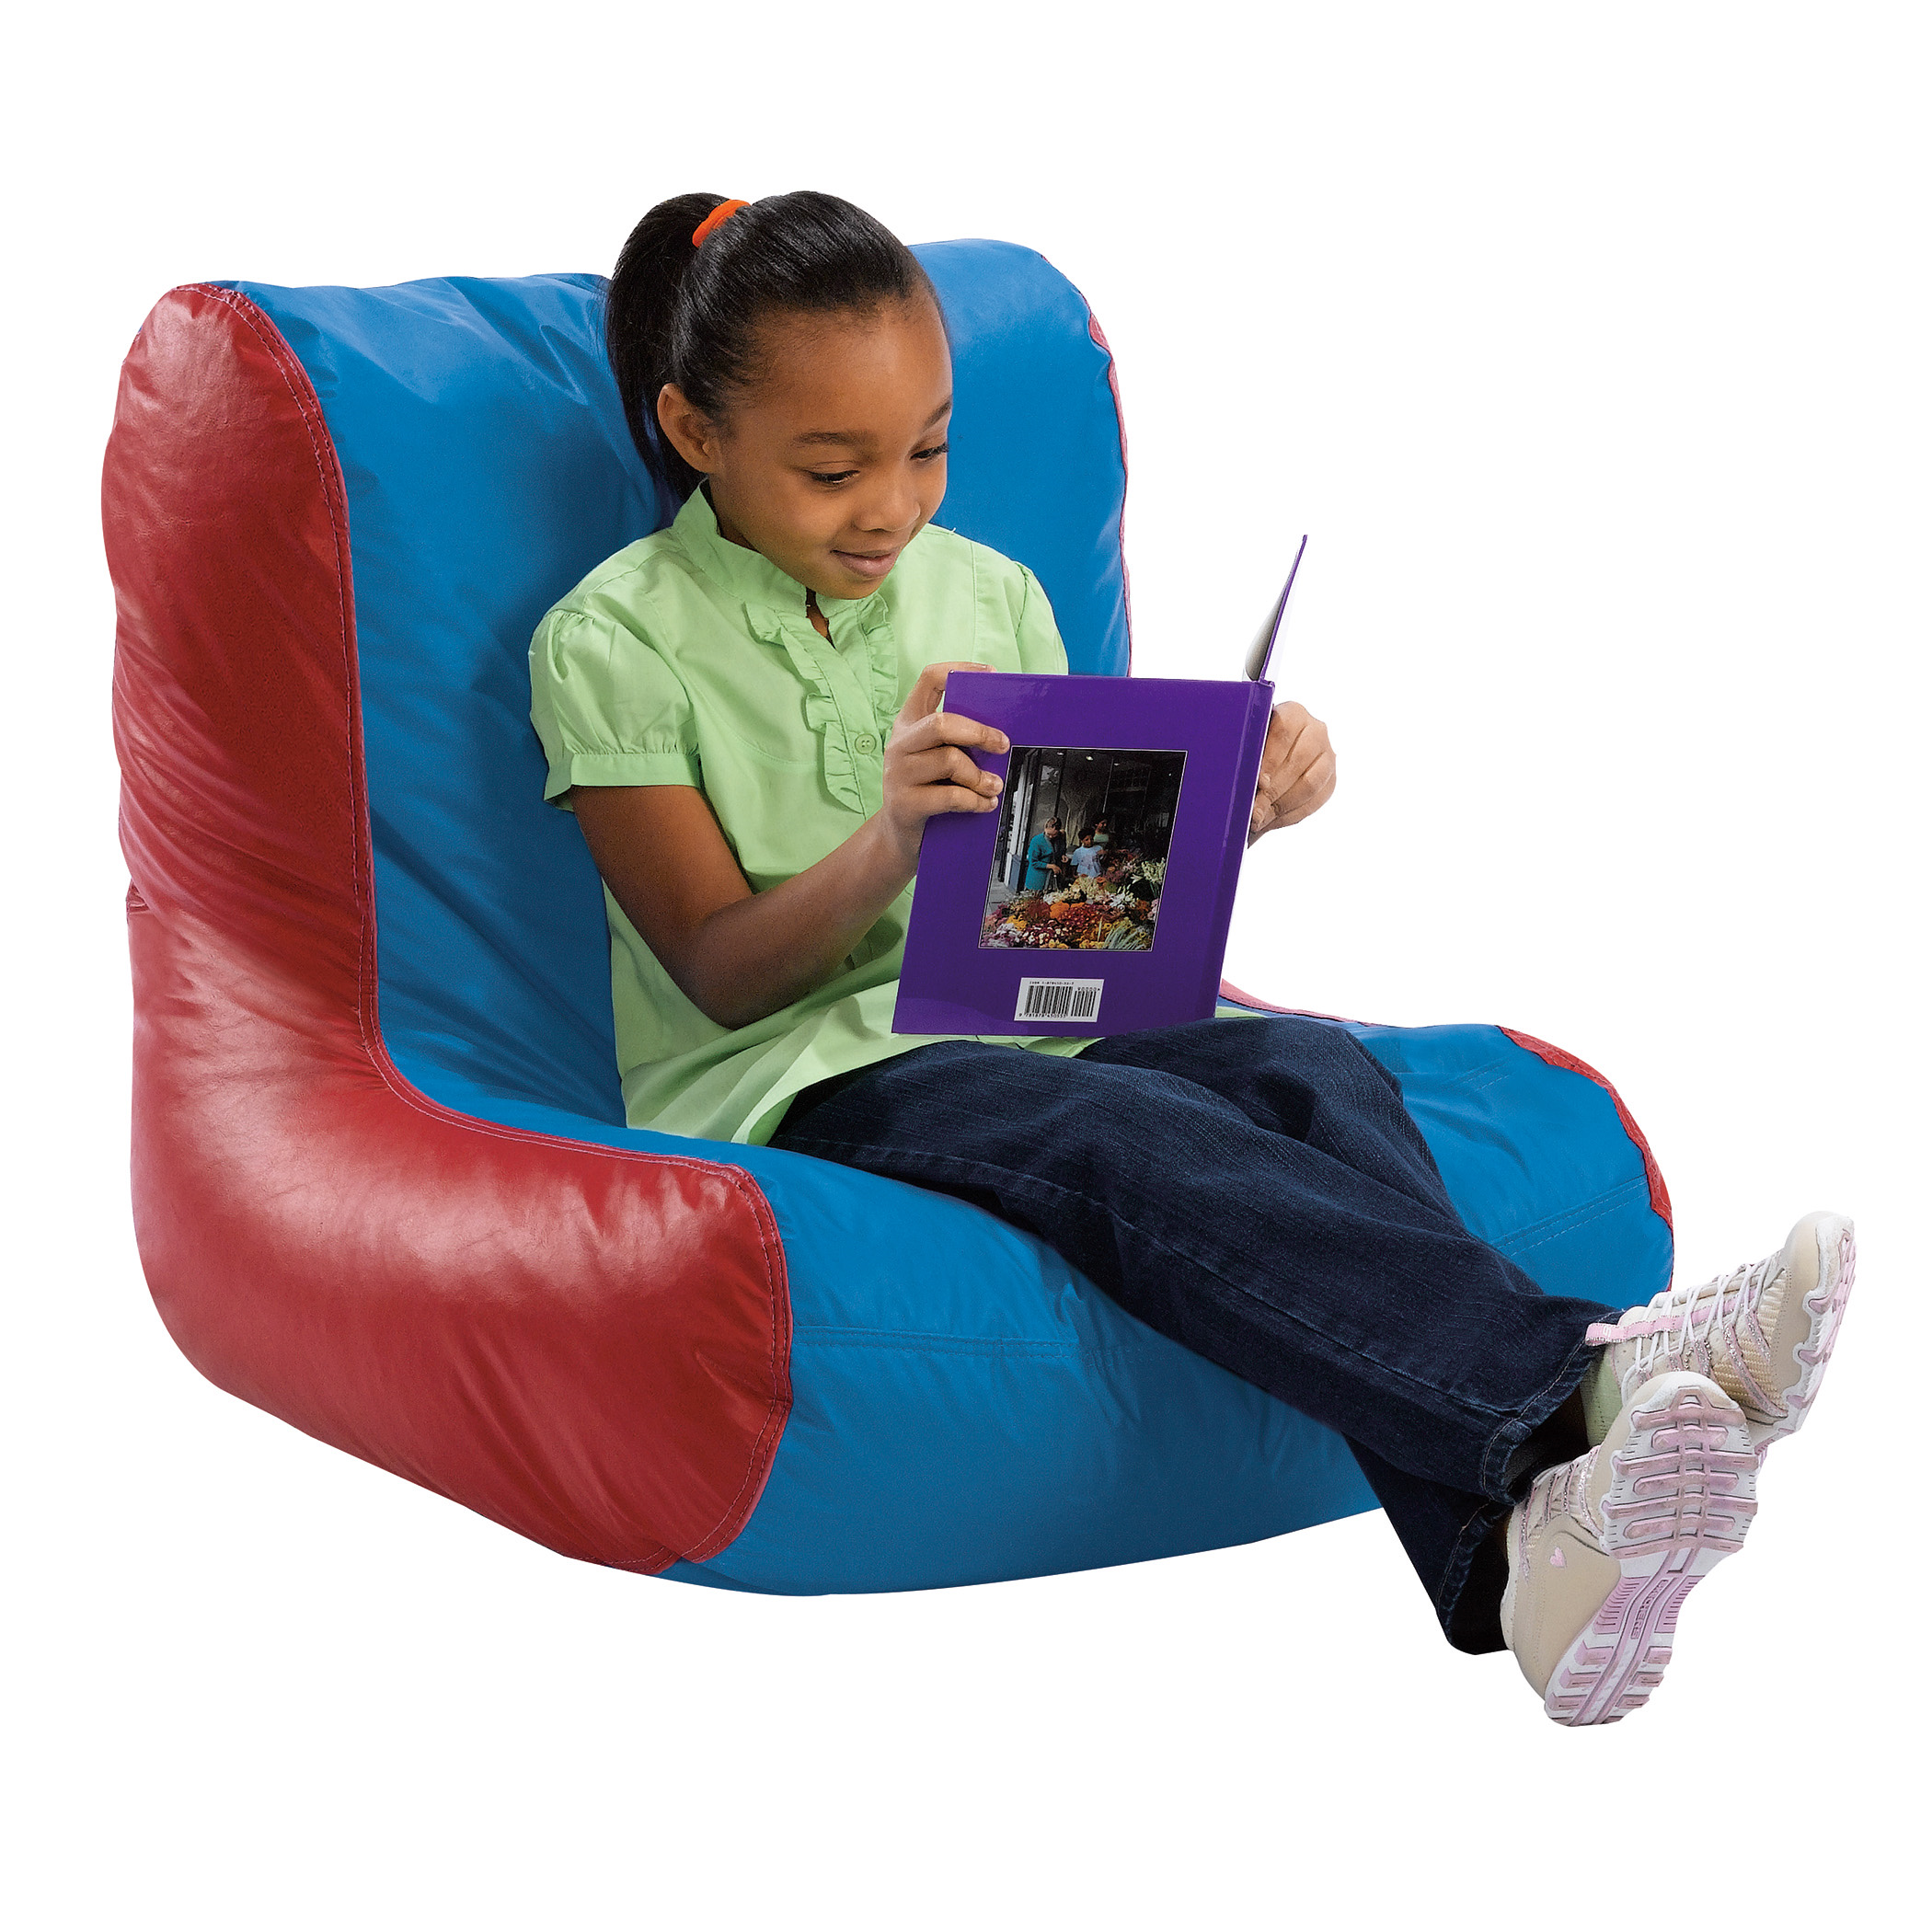 Pleasing High Back Bean Bag Chairs Beckers School Supplies Customarchery Wood Chair Design Ideas Customarcherynet